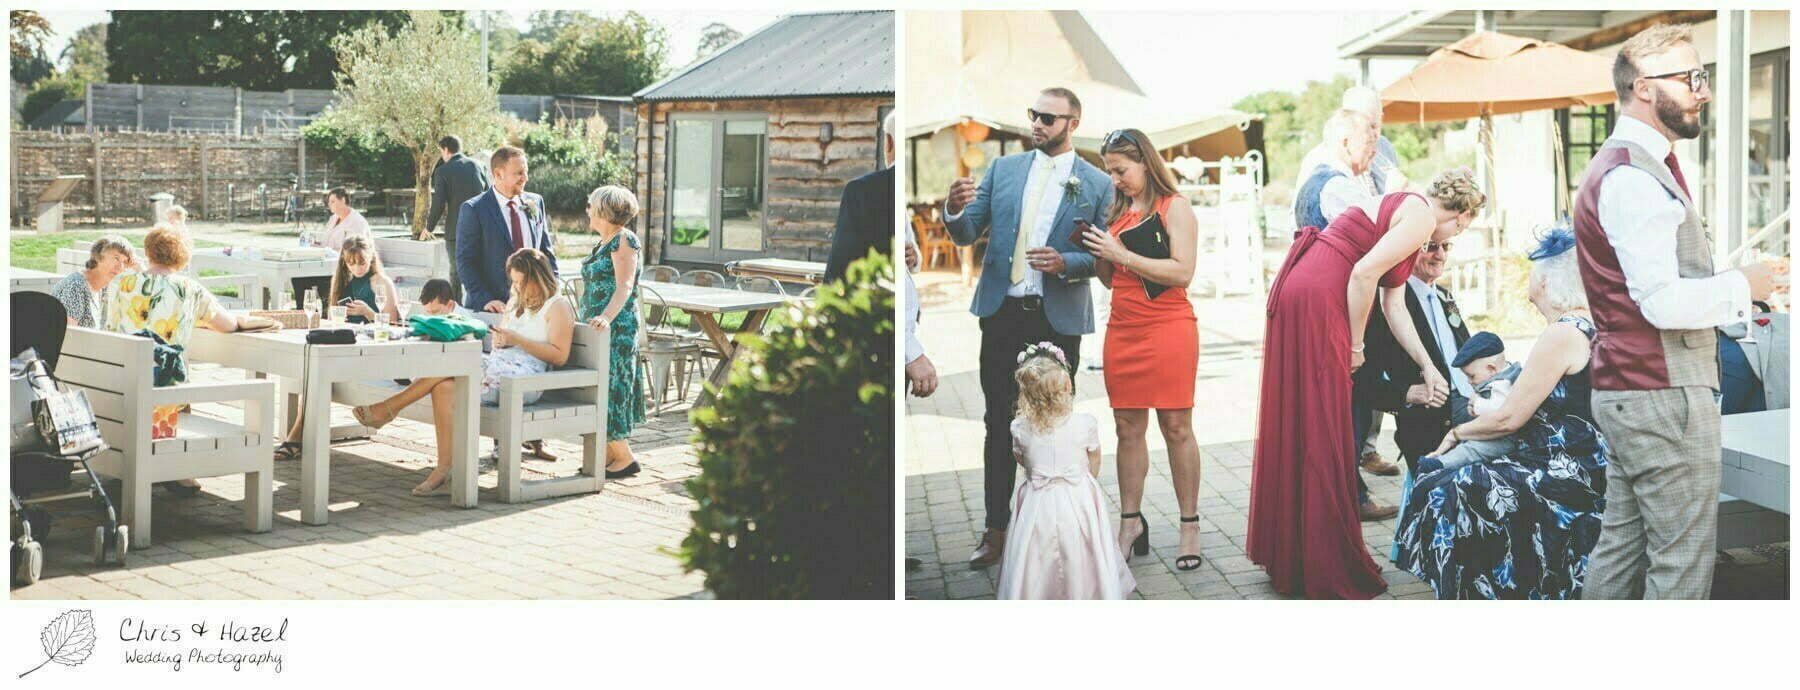 Wedding Guests outside The Glove Factory Wedding Photography, Wiltshire Wedding Photographer Trowbridge, Chris and Hazel Wedding Photography